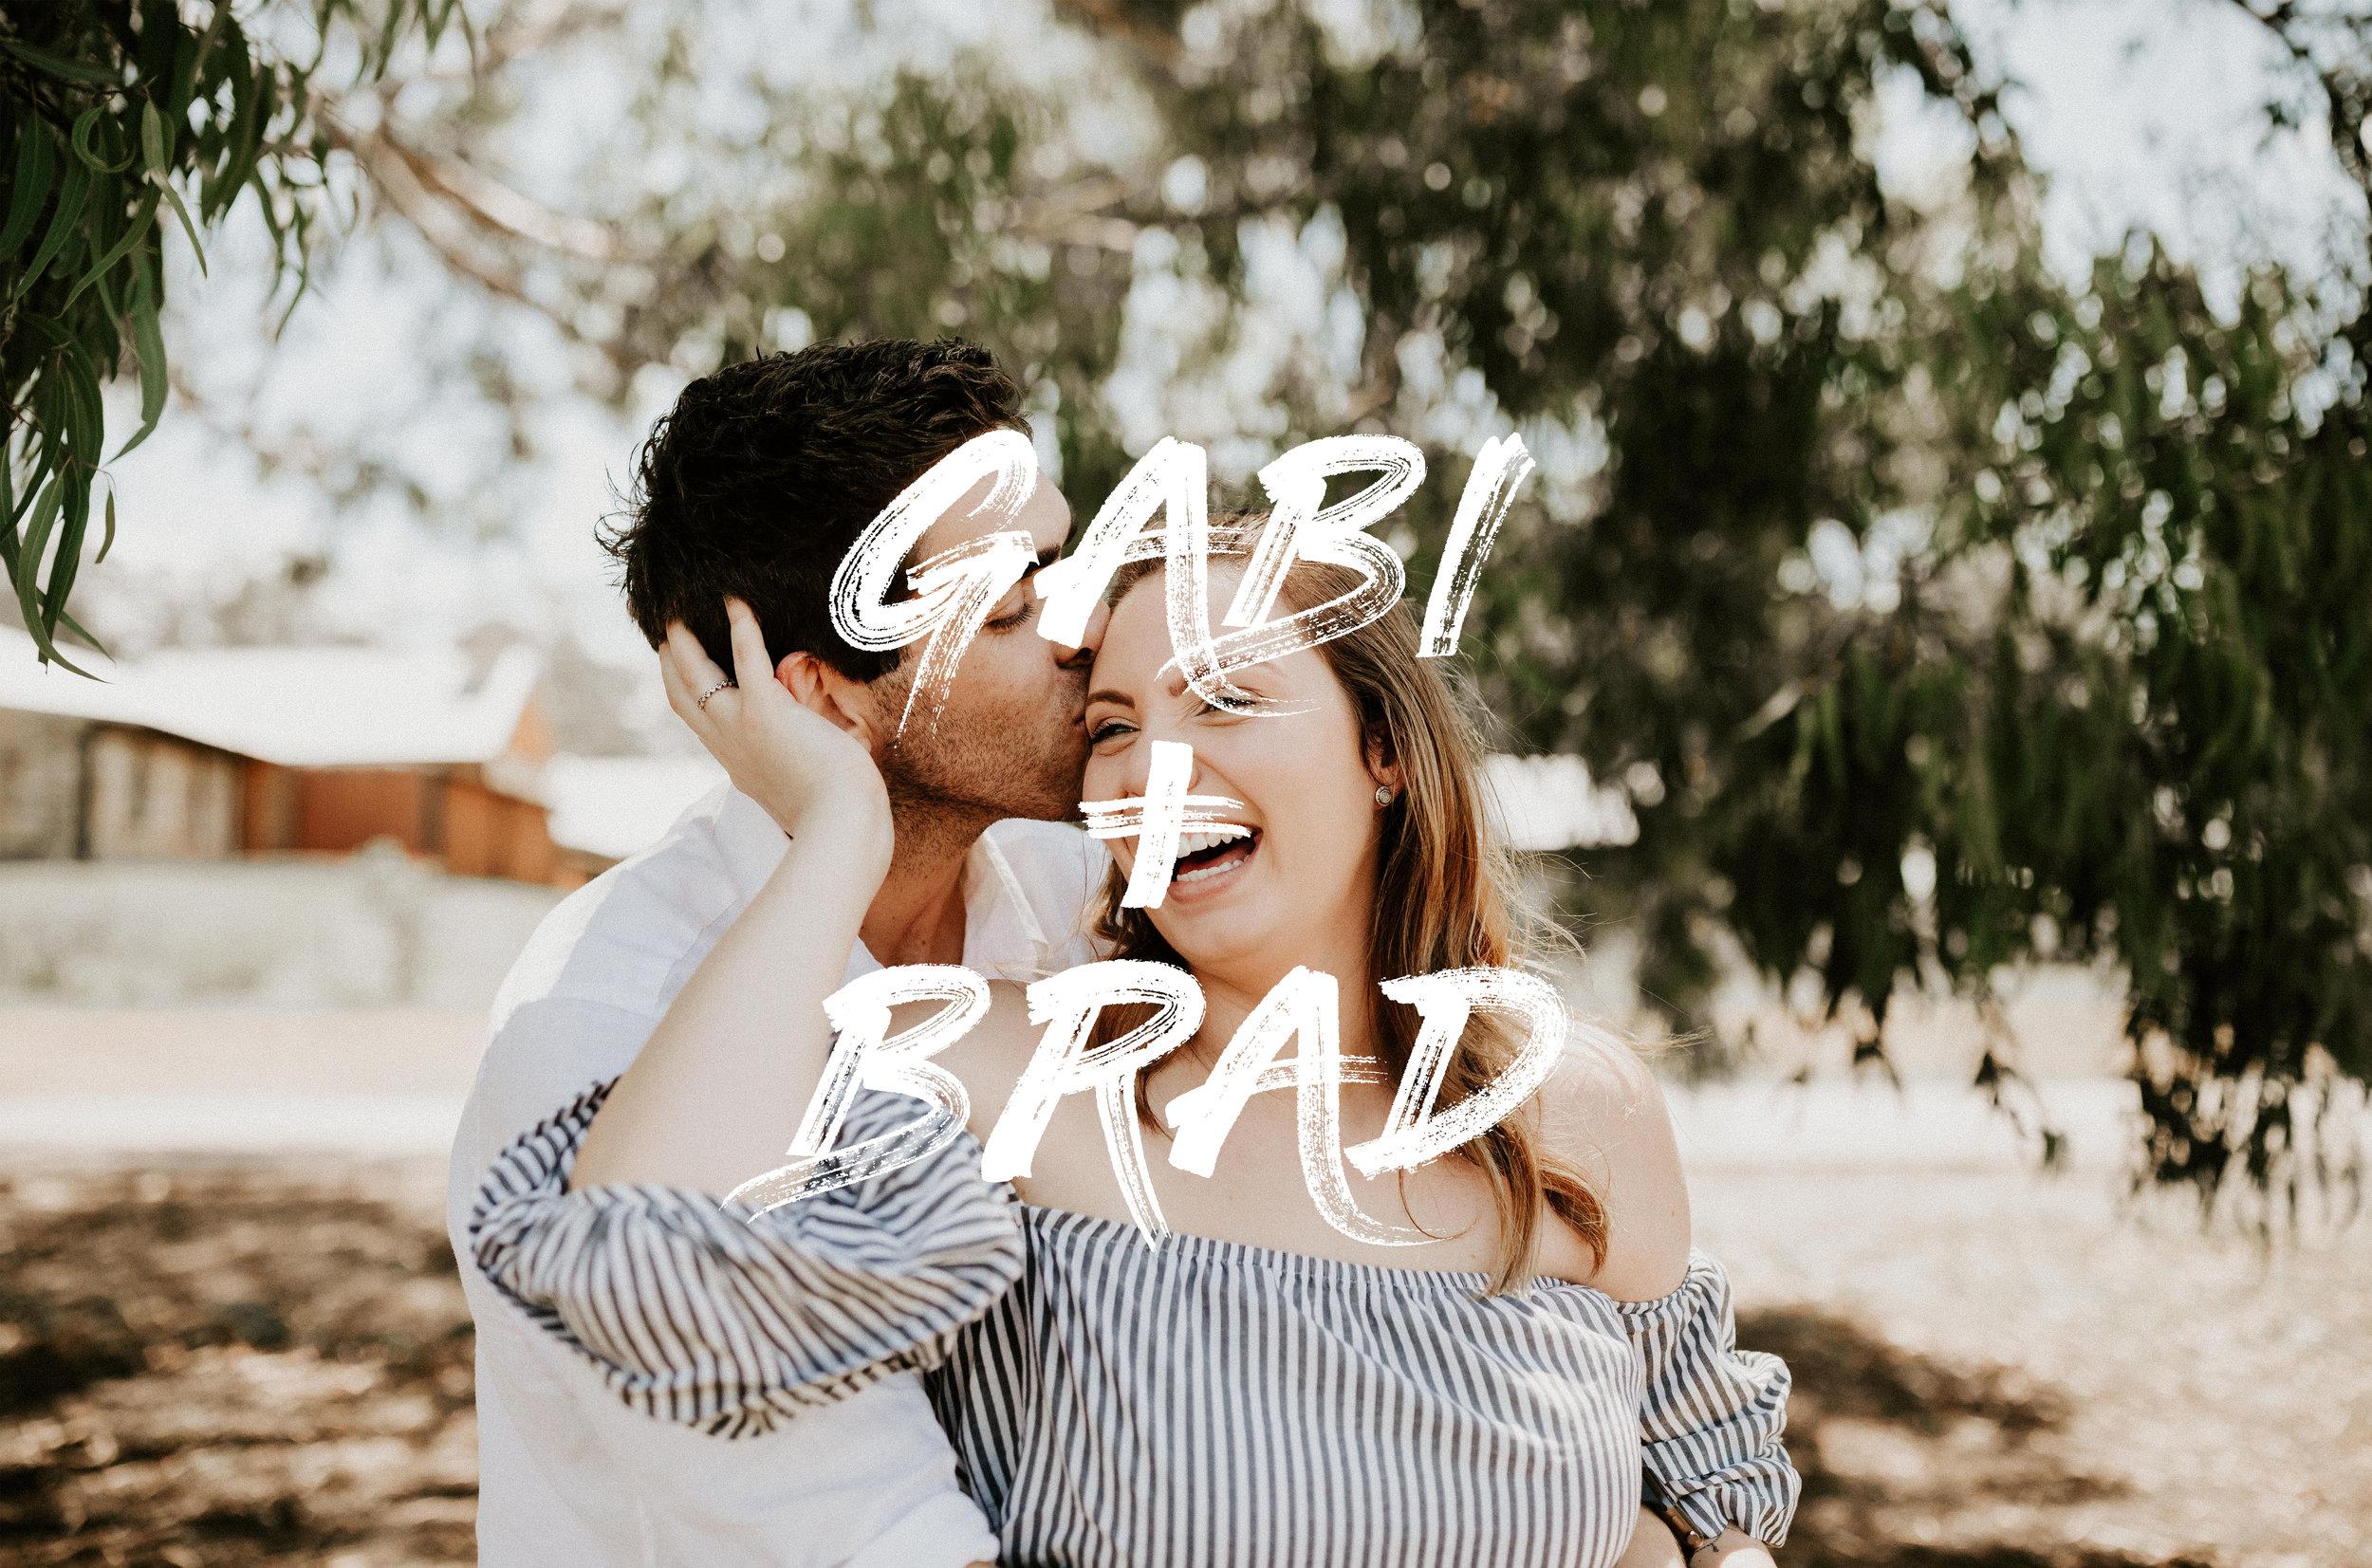 Gabi+BradThumbnail.jpg